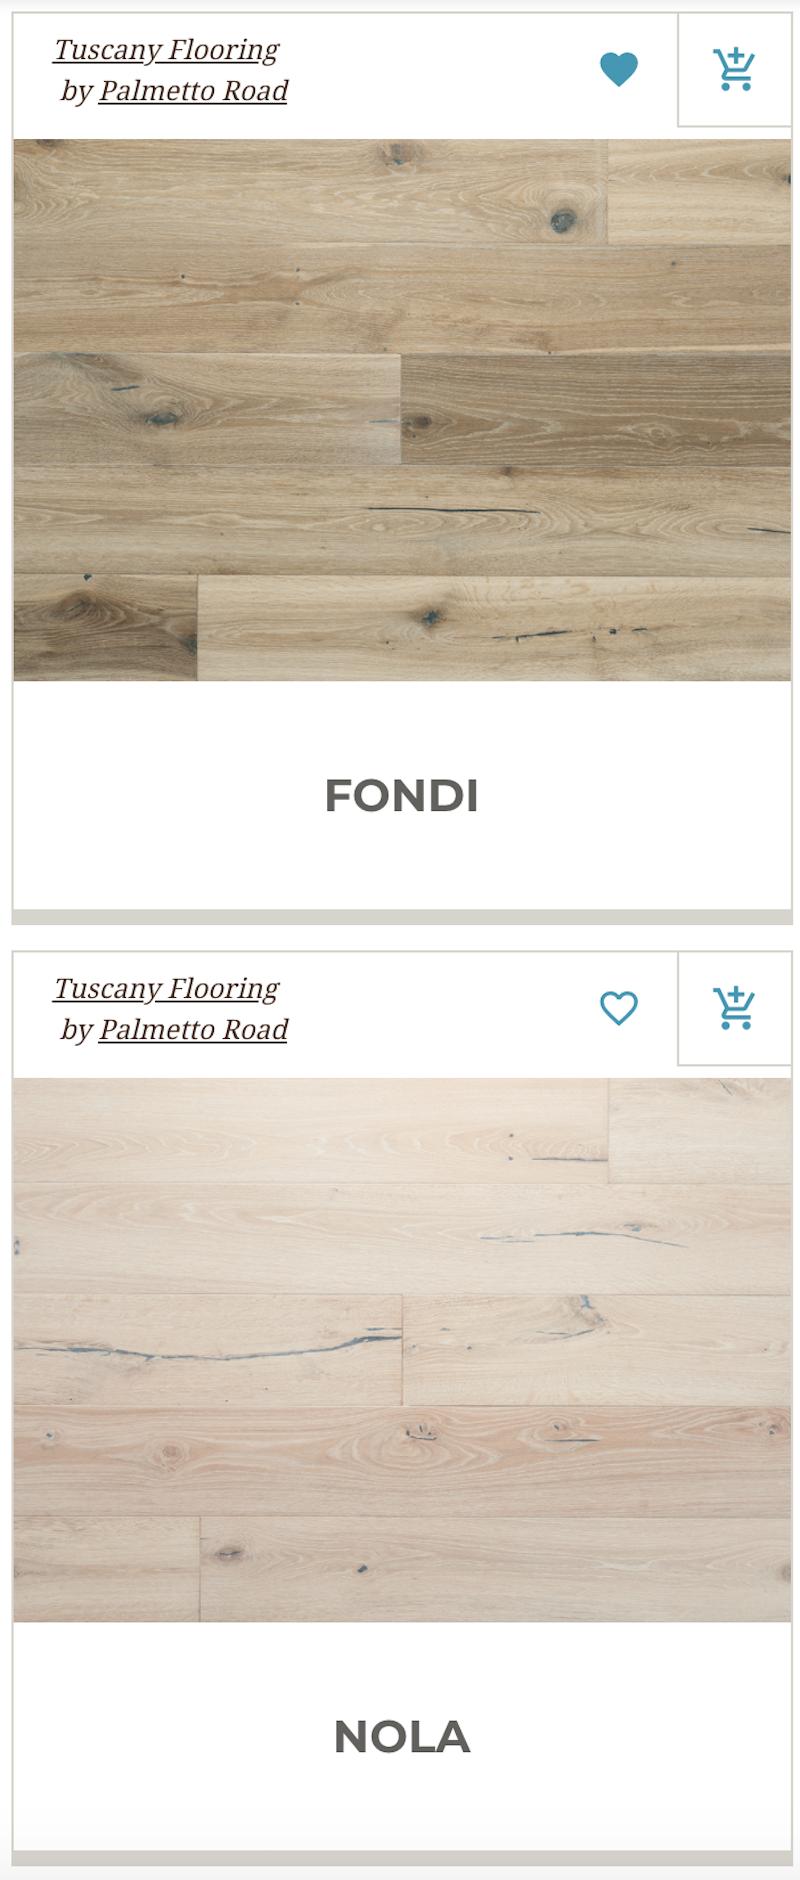 Twenty and Oak - Tuscany Flooring - Fondi and Nola